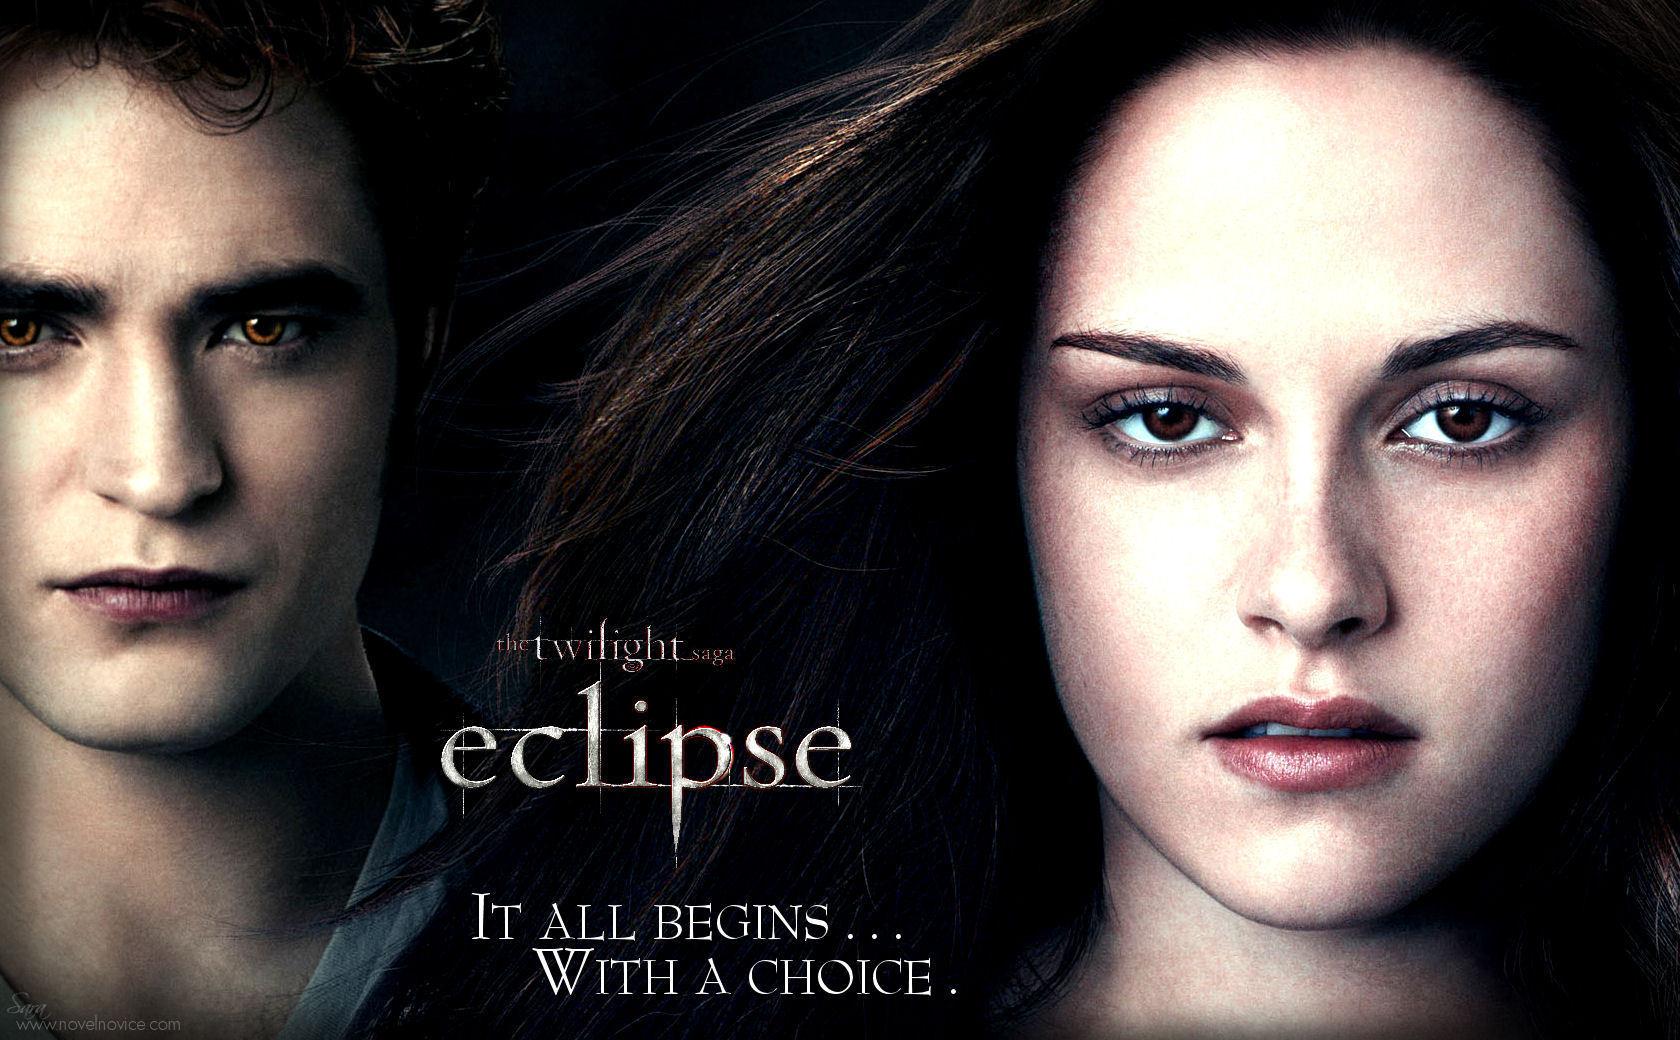 Desktop fonds d'écran for The Twilight Saga Eclipse